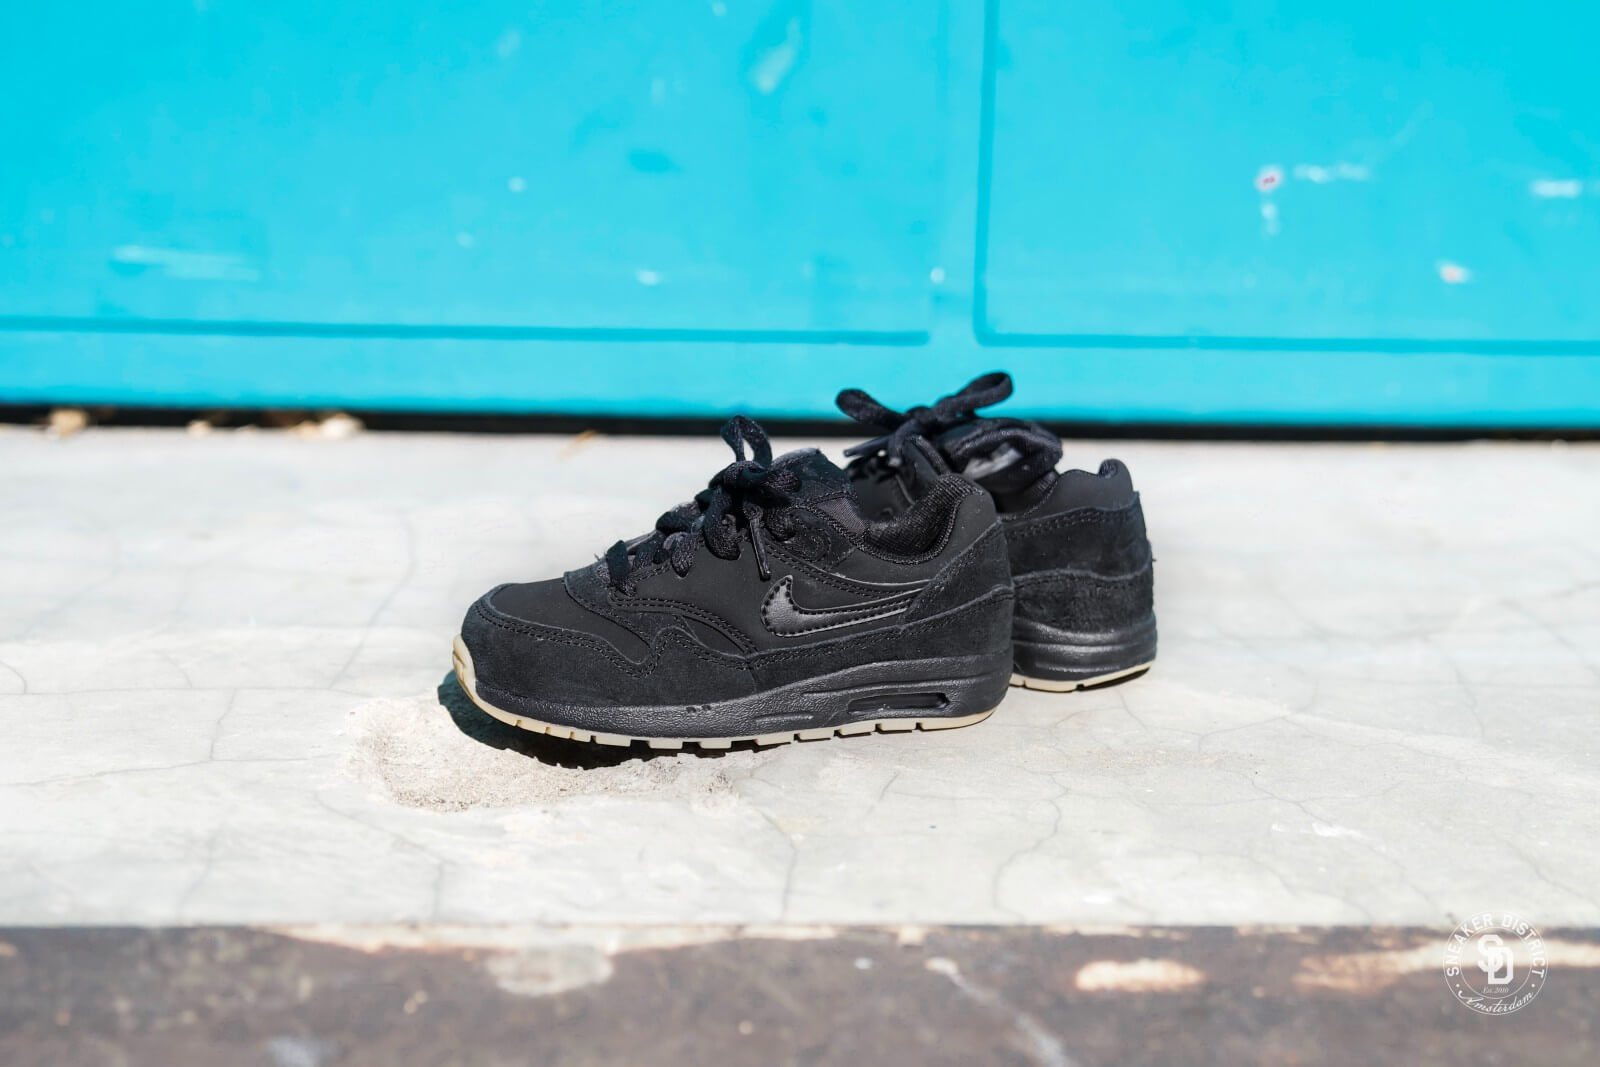 Nike Air Max 1 Td Black Black Gum 807604 008